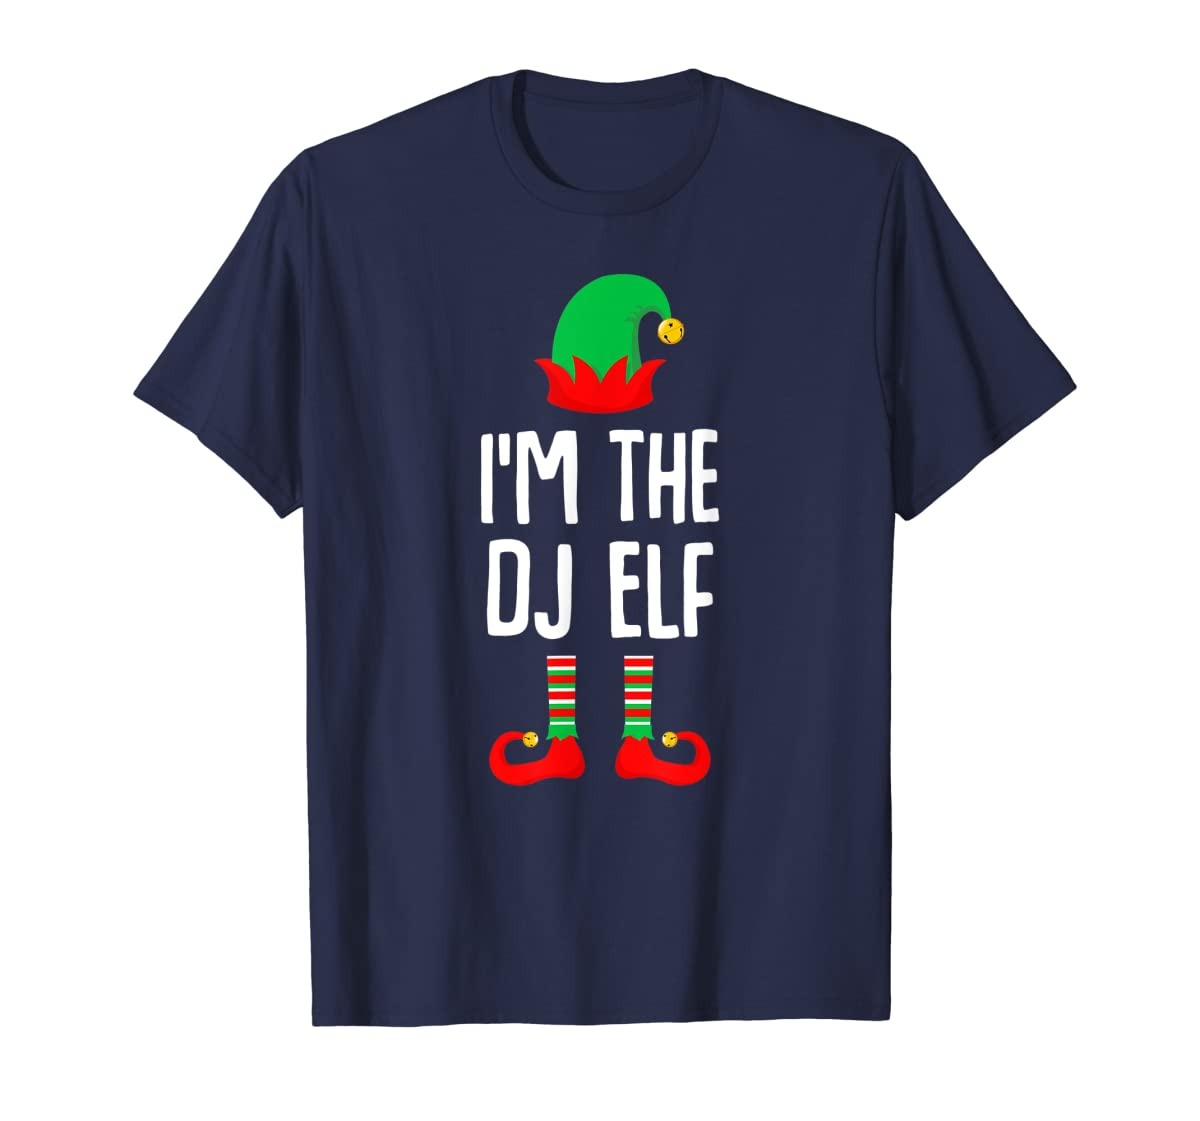 I'm The Dj Elf Matching Family Group Christmas T-Shirt-Men's T-Shirt-Navy